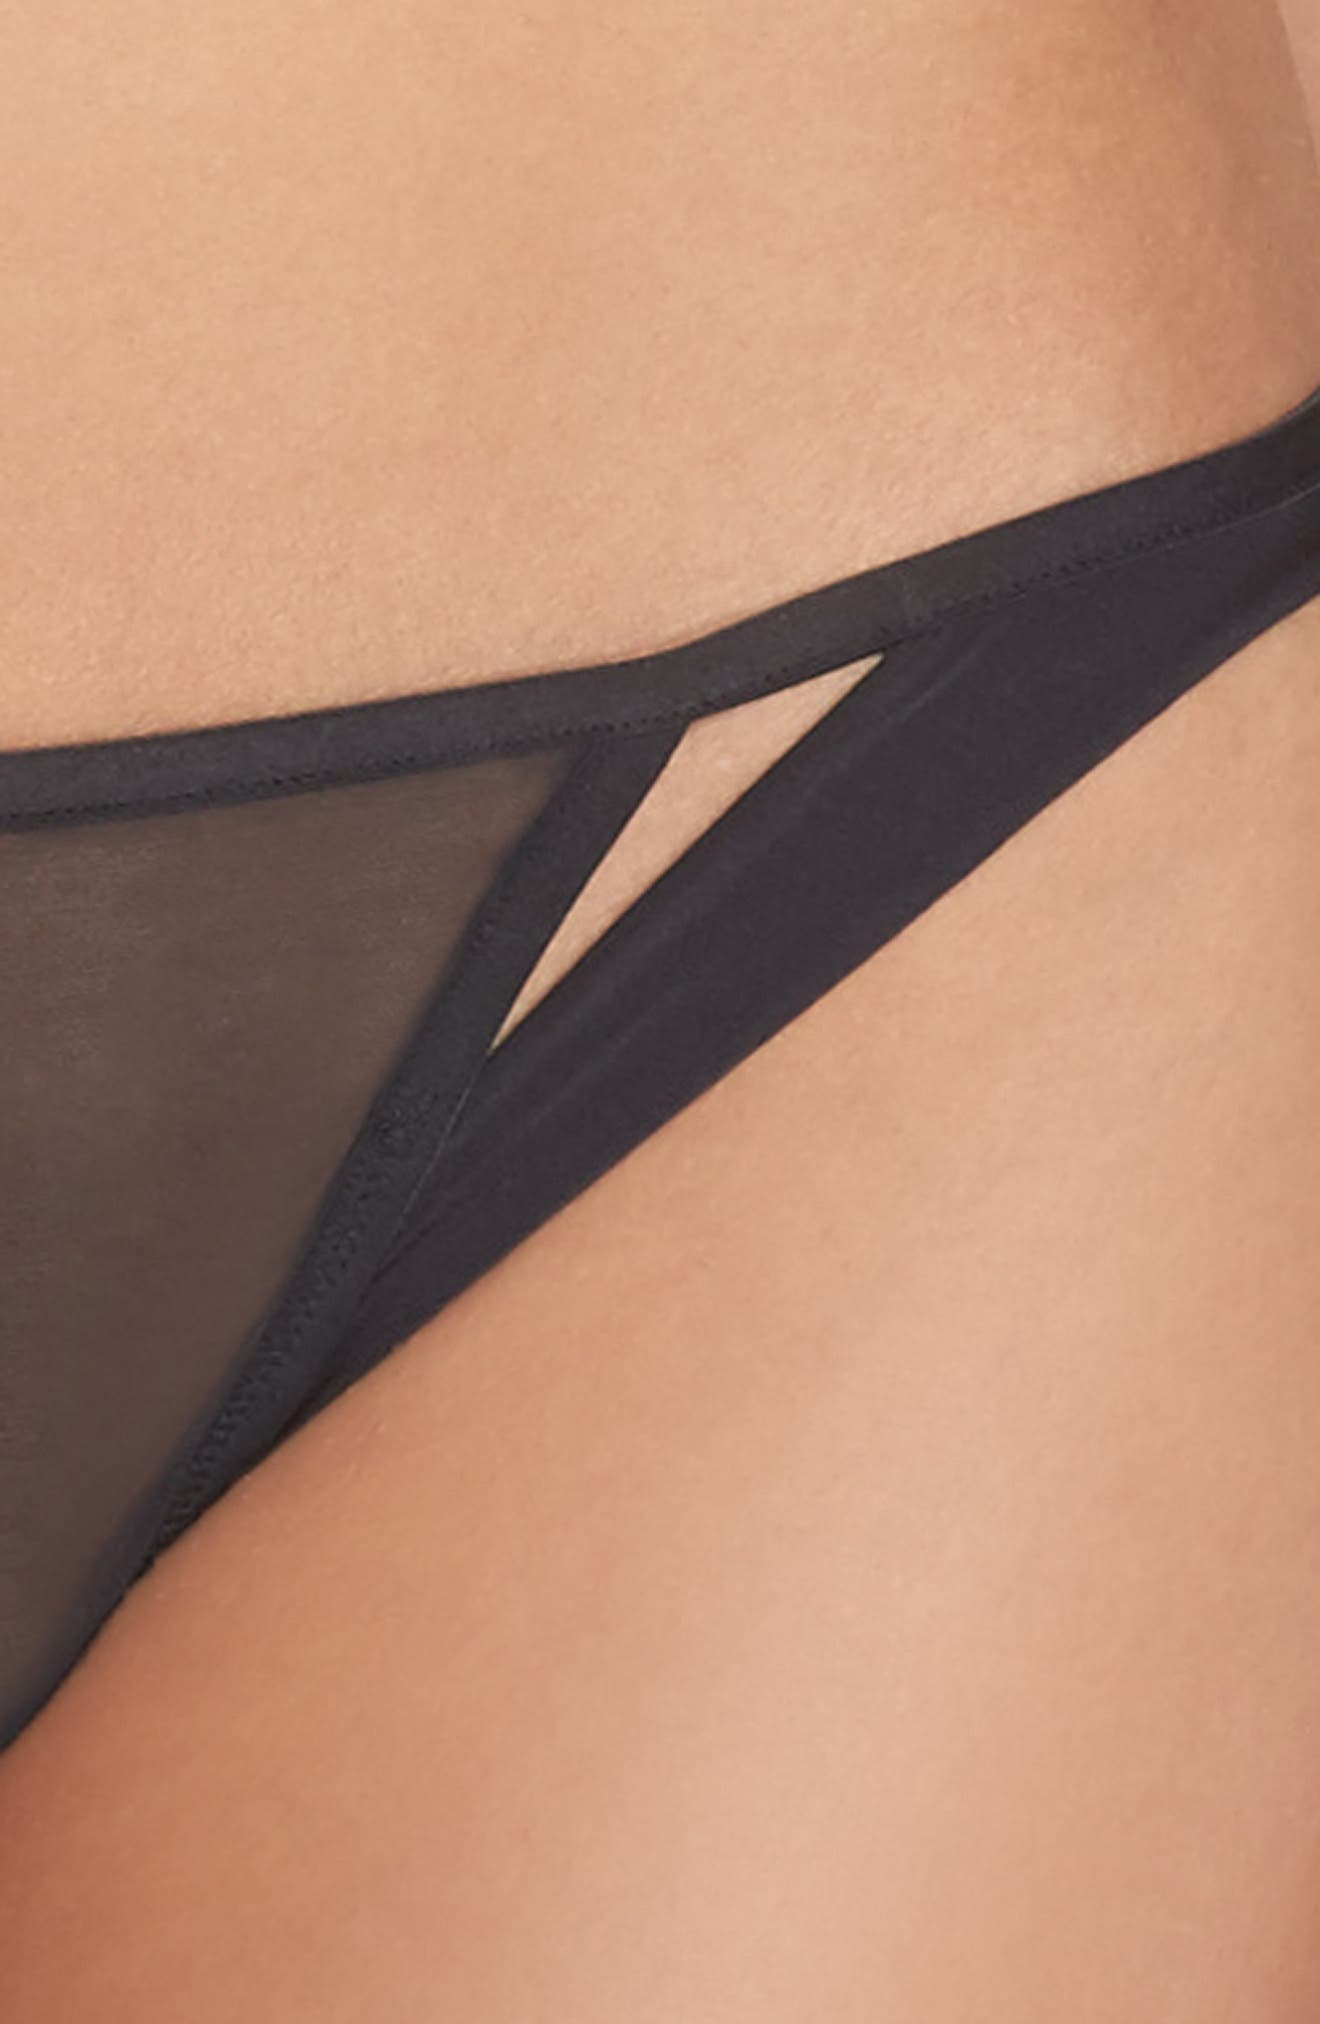 Lace Thong,                             Alternate thumbnail 4, color,                             001